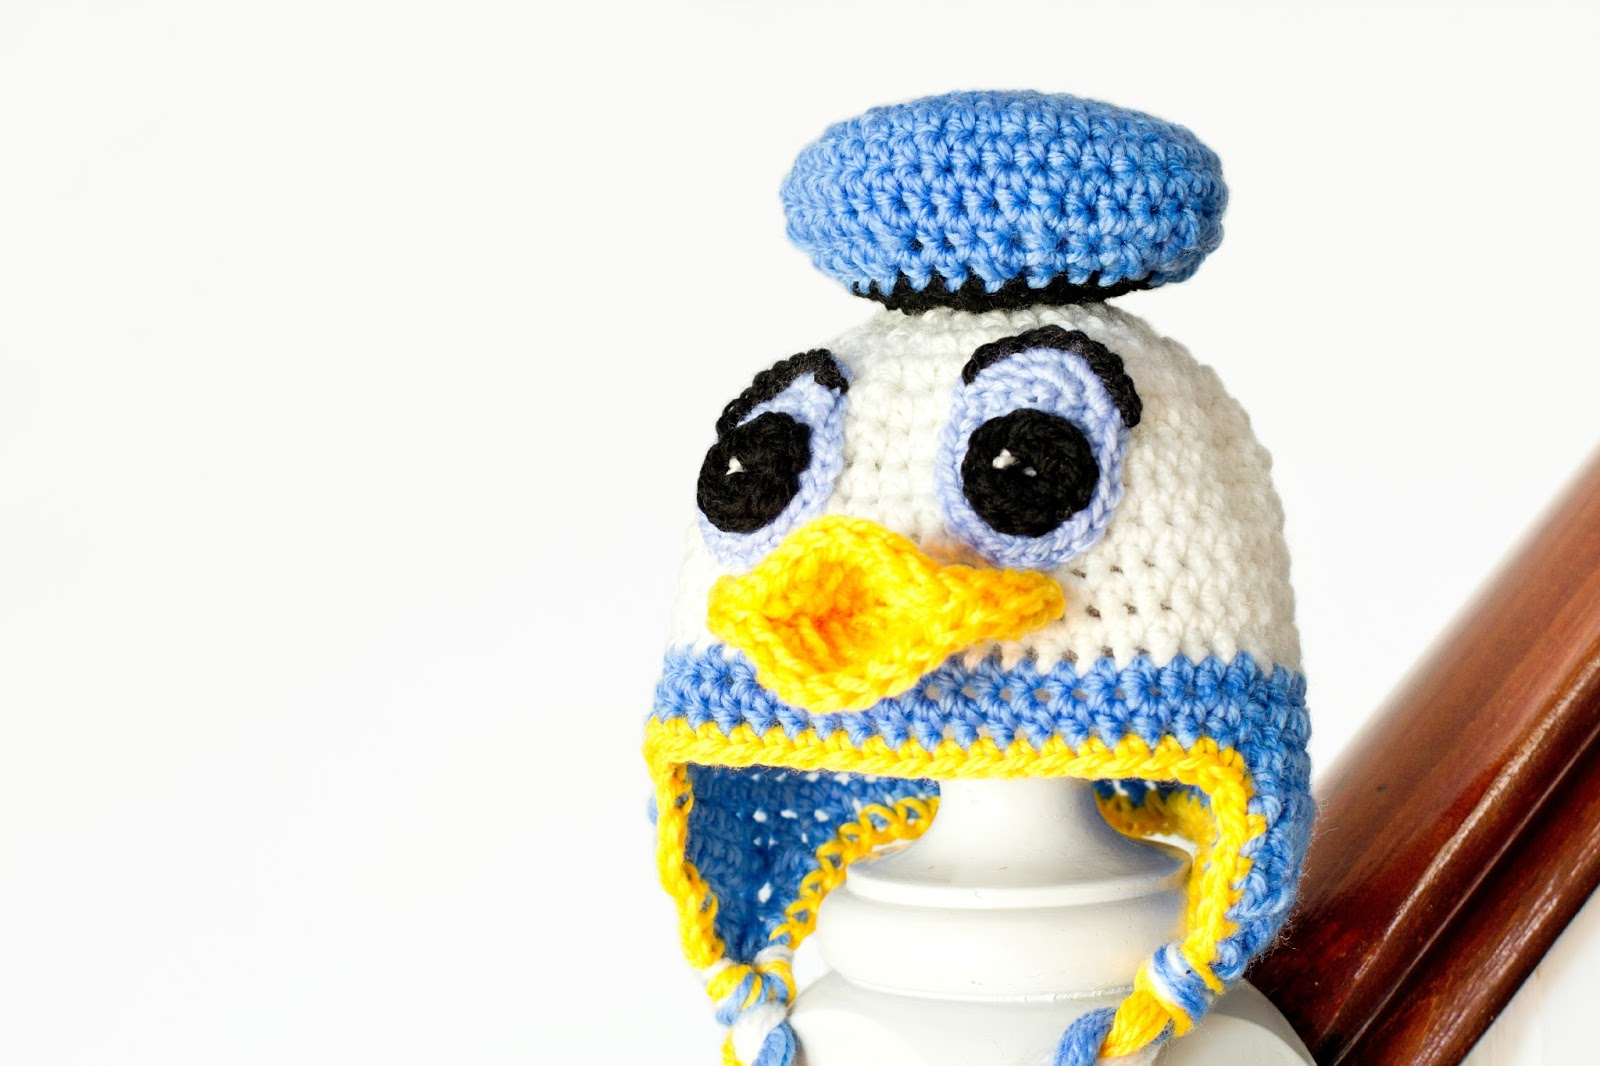 http://4.bp.blogspot.com/-sbspSUVtzD0/UwNLIKaLXMI/AAAAAAAAHC4/LqJYIA4XM1Y/s1600/Donald+Duck+Inspired+Baby+Hat+Crochet+Pattern.jpg